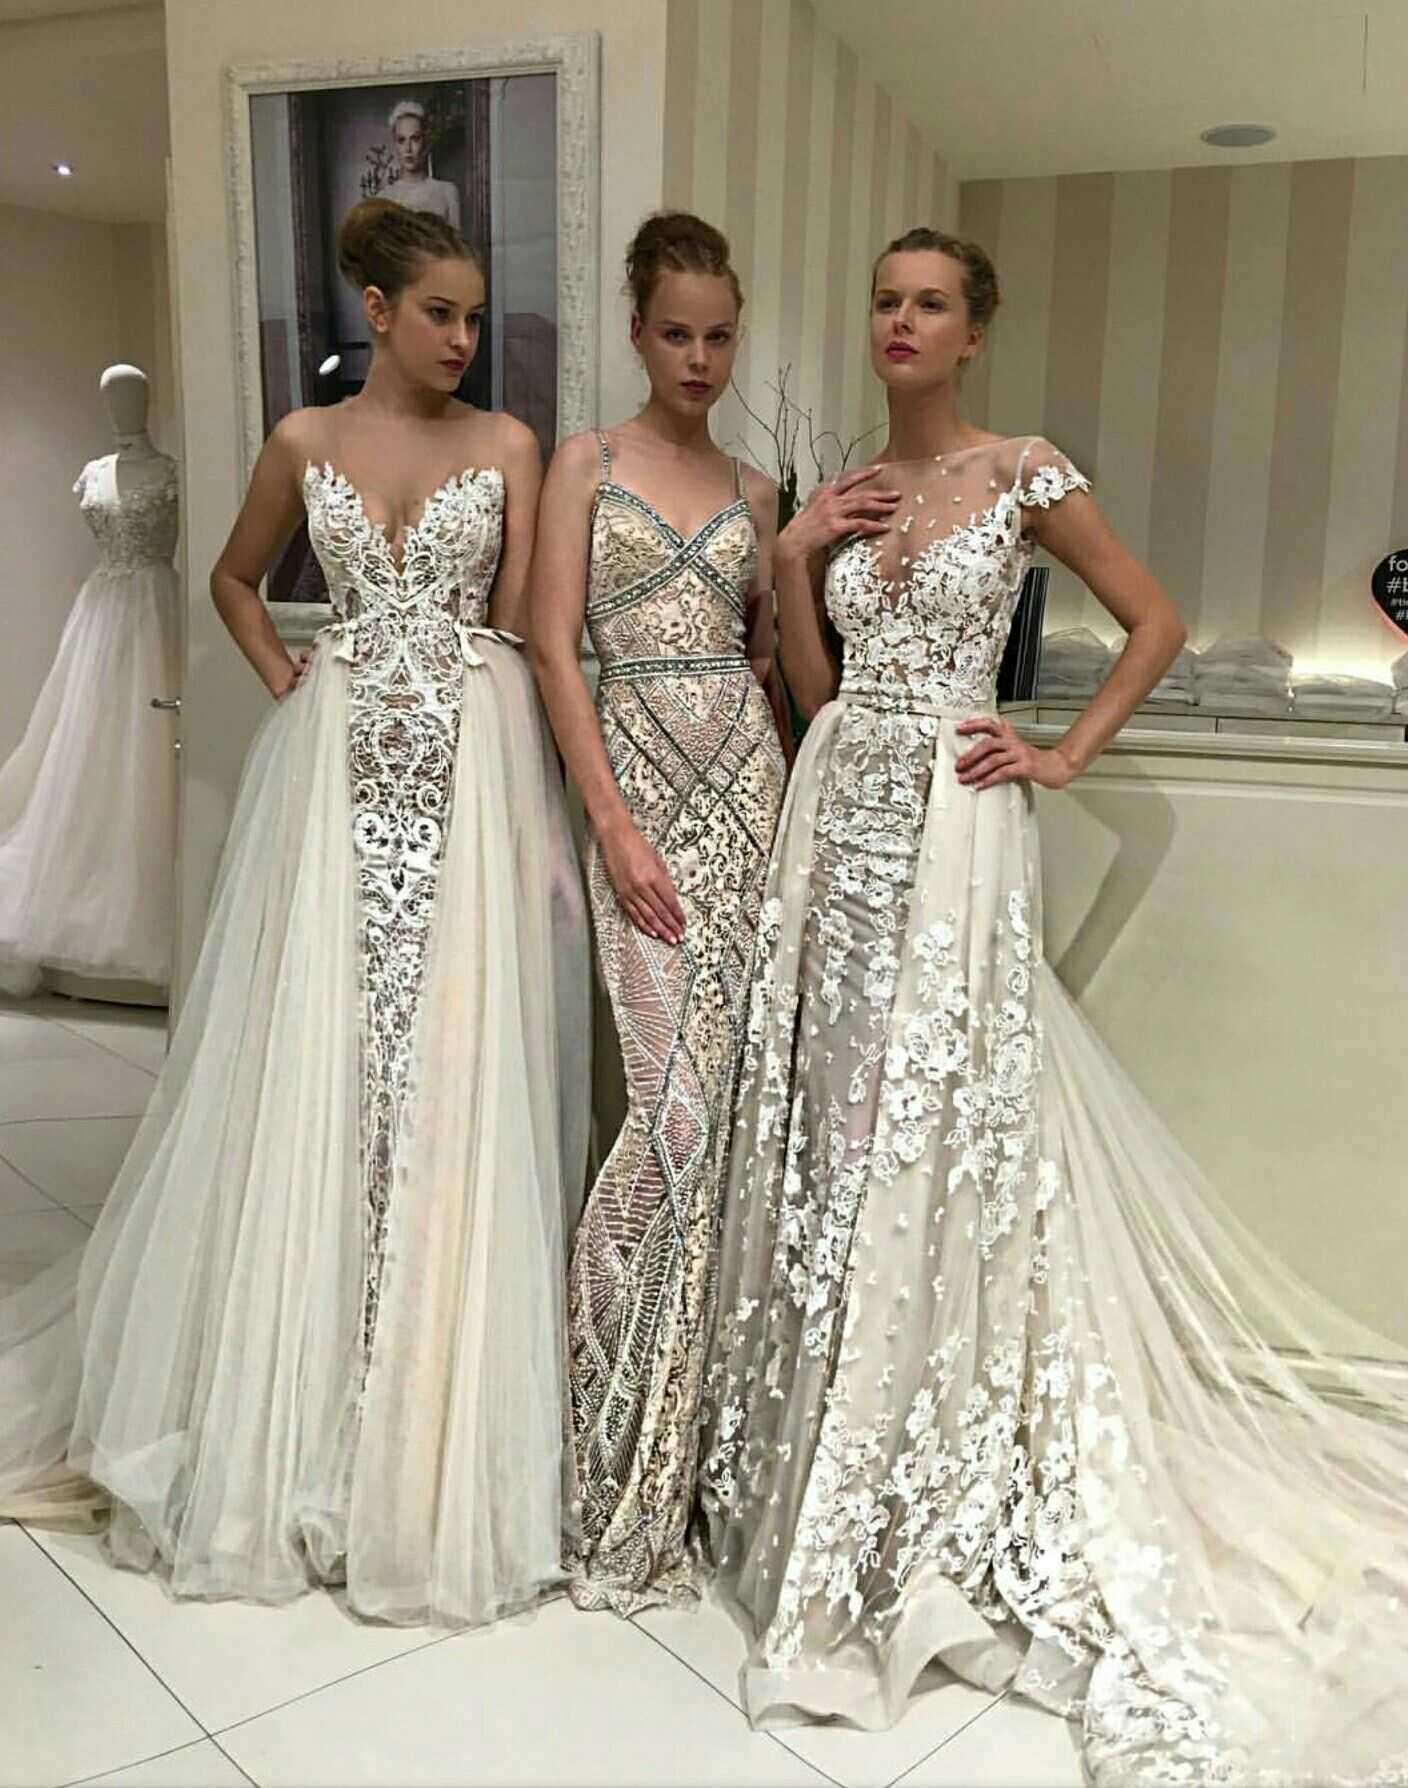 Gorgeous detailed wedding dresses | Dream Wedding | Pinterest ...